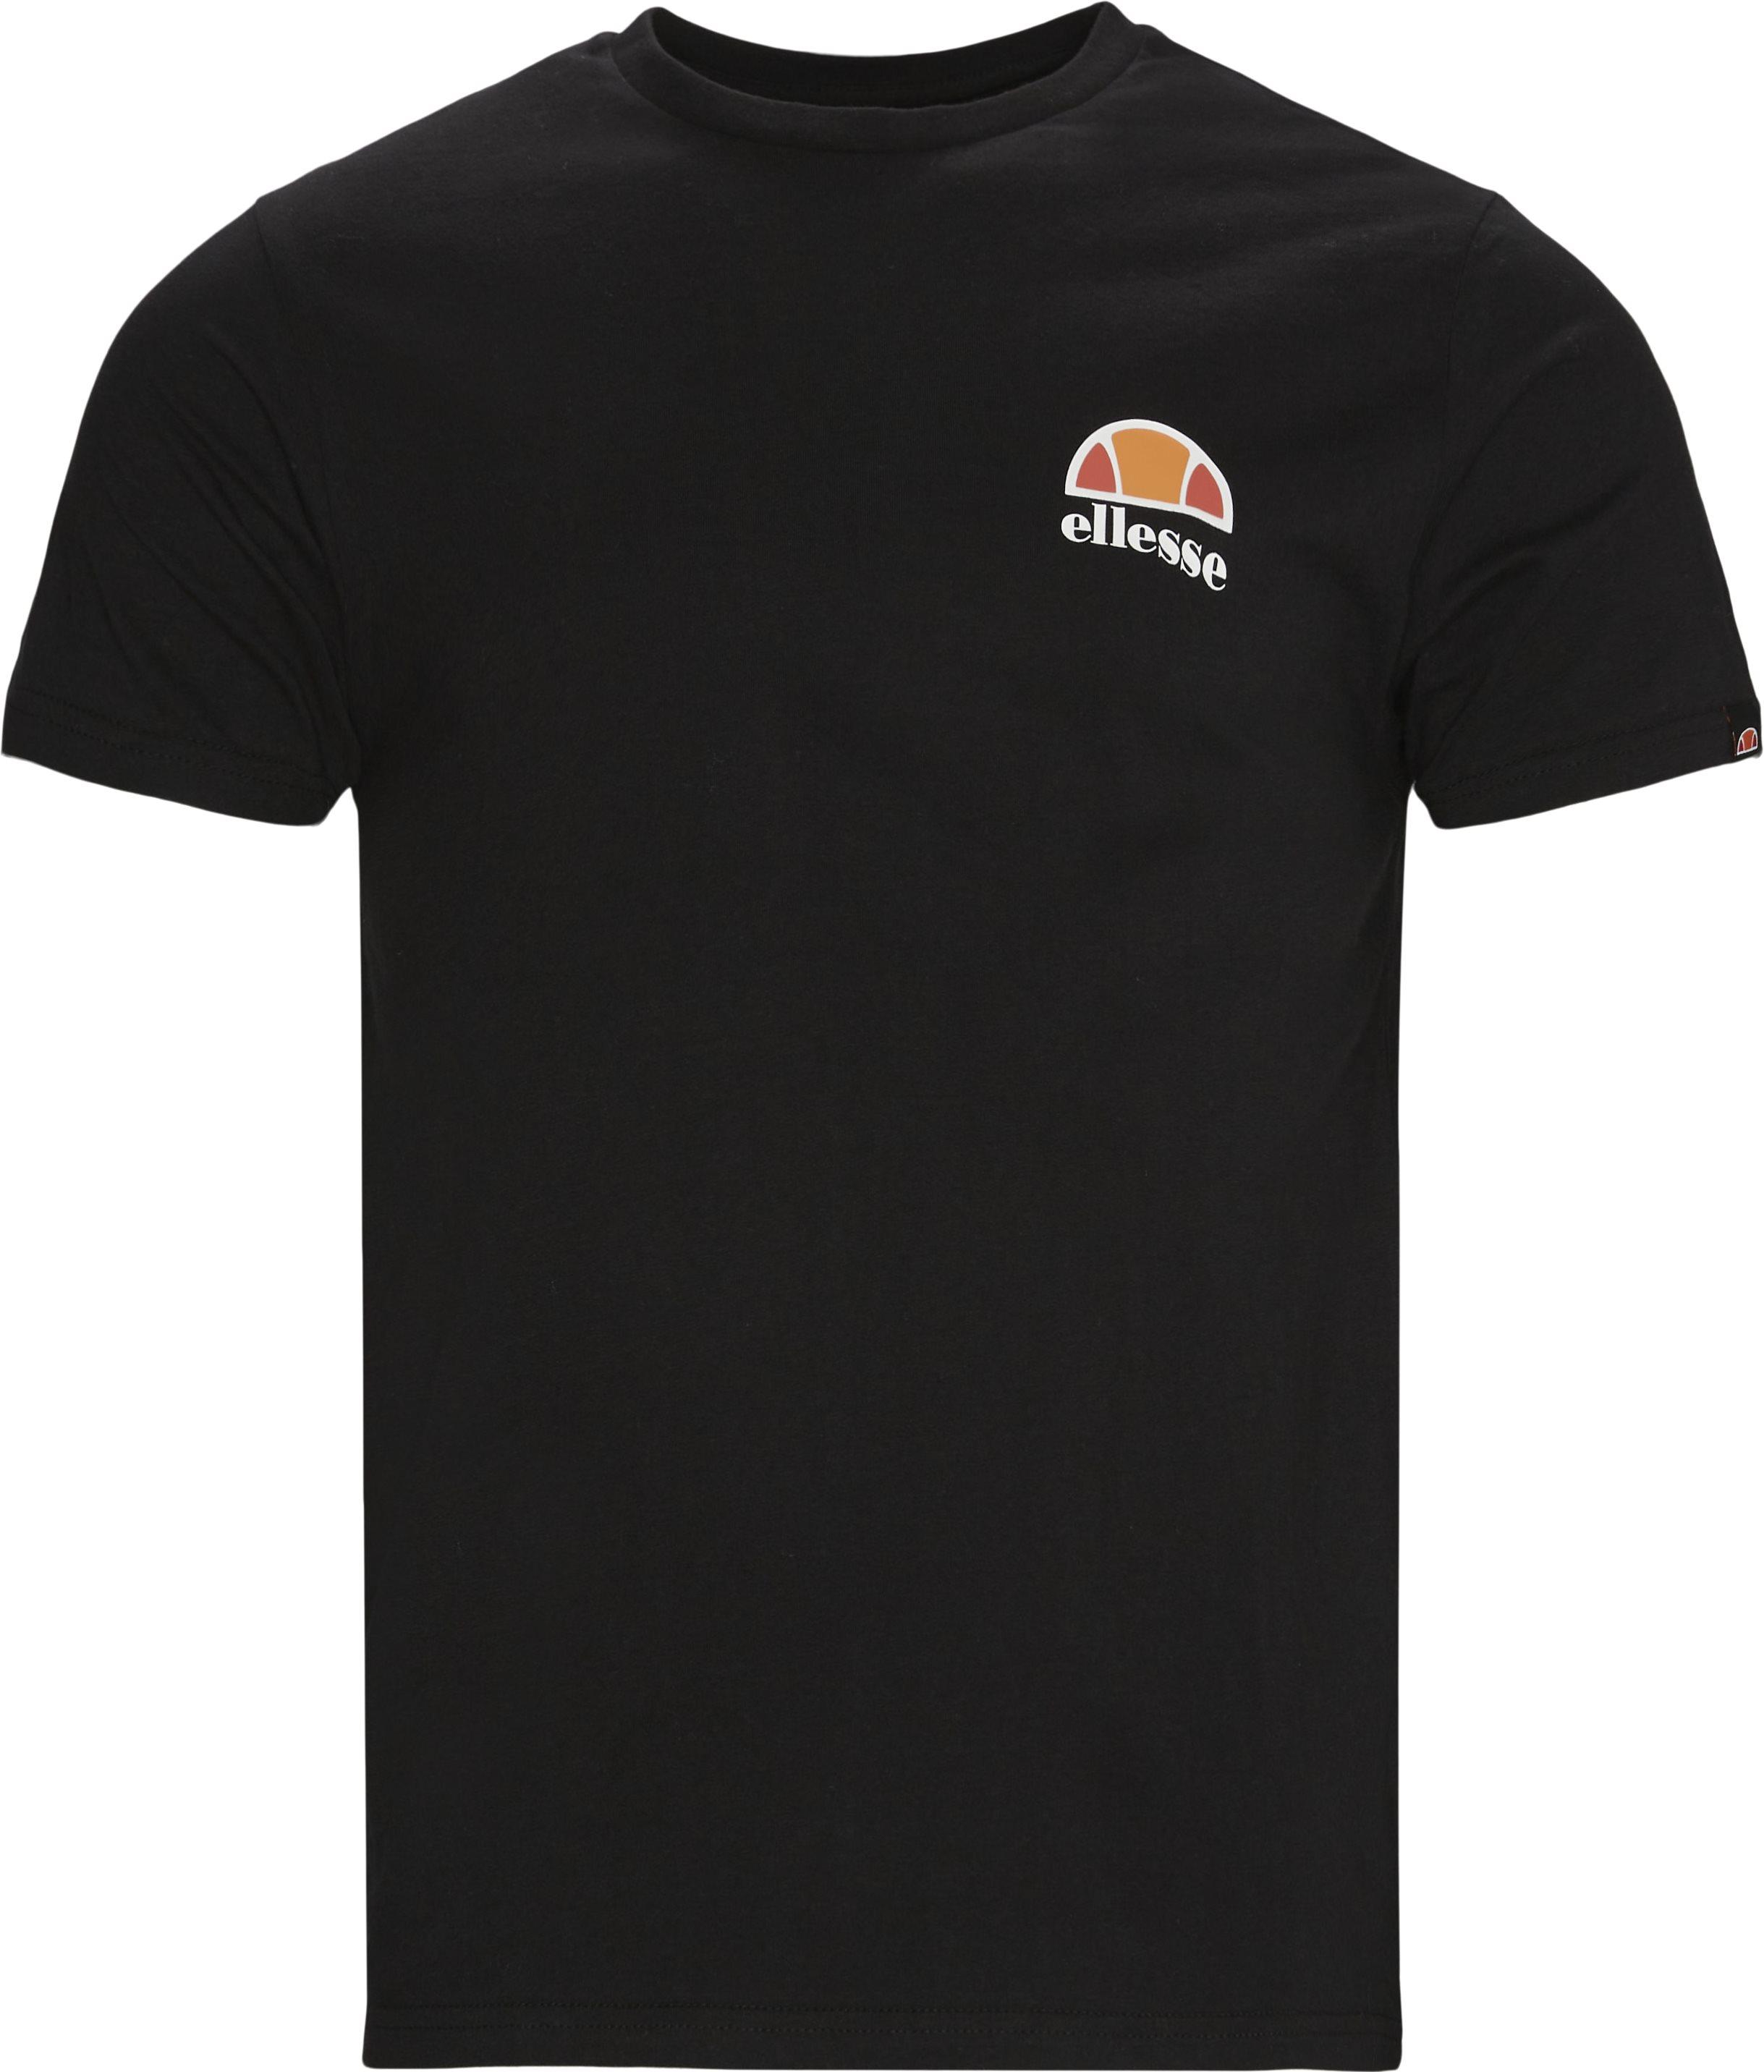 Canaletto T-shirt - T-shirts - Regular - Sort